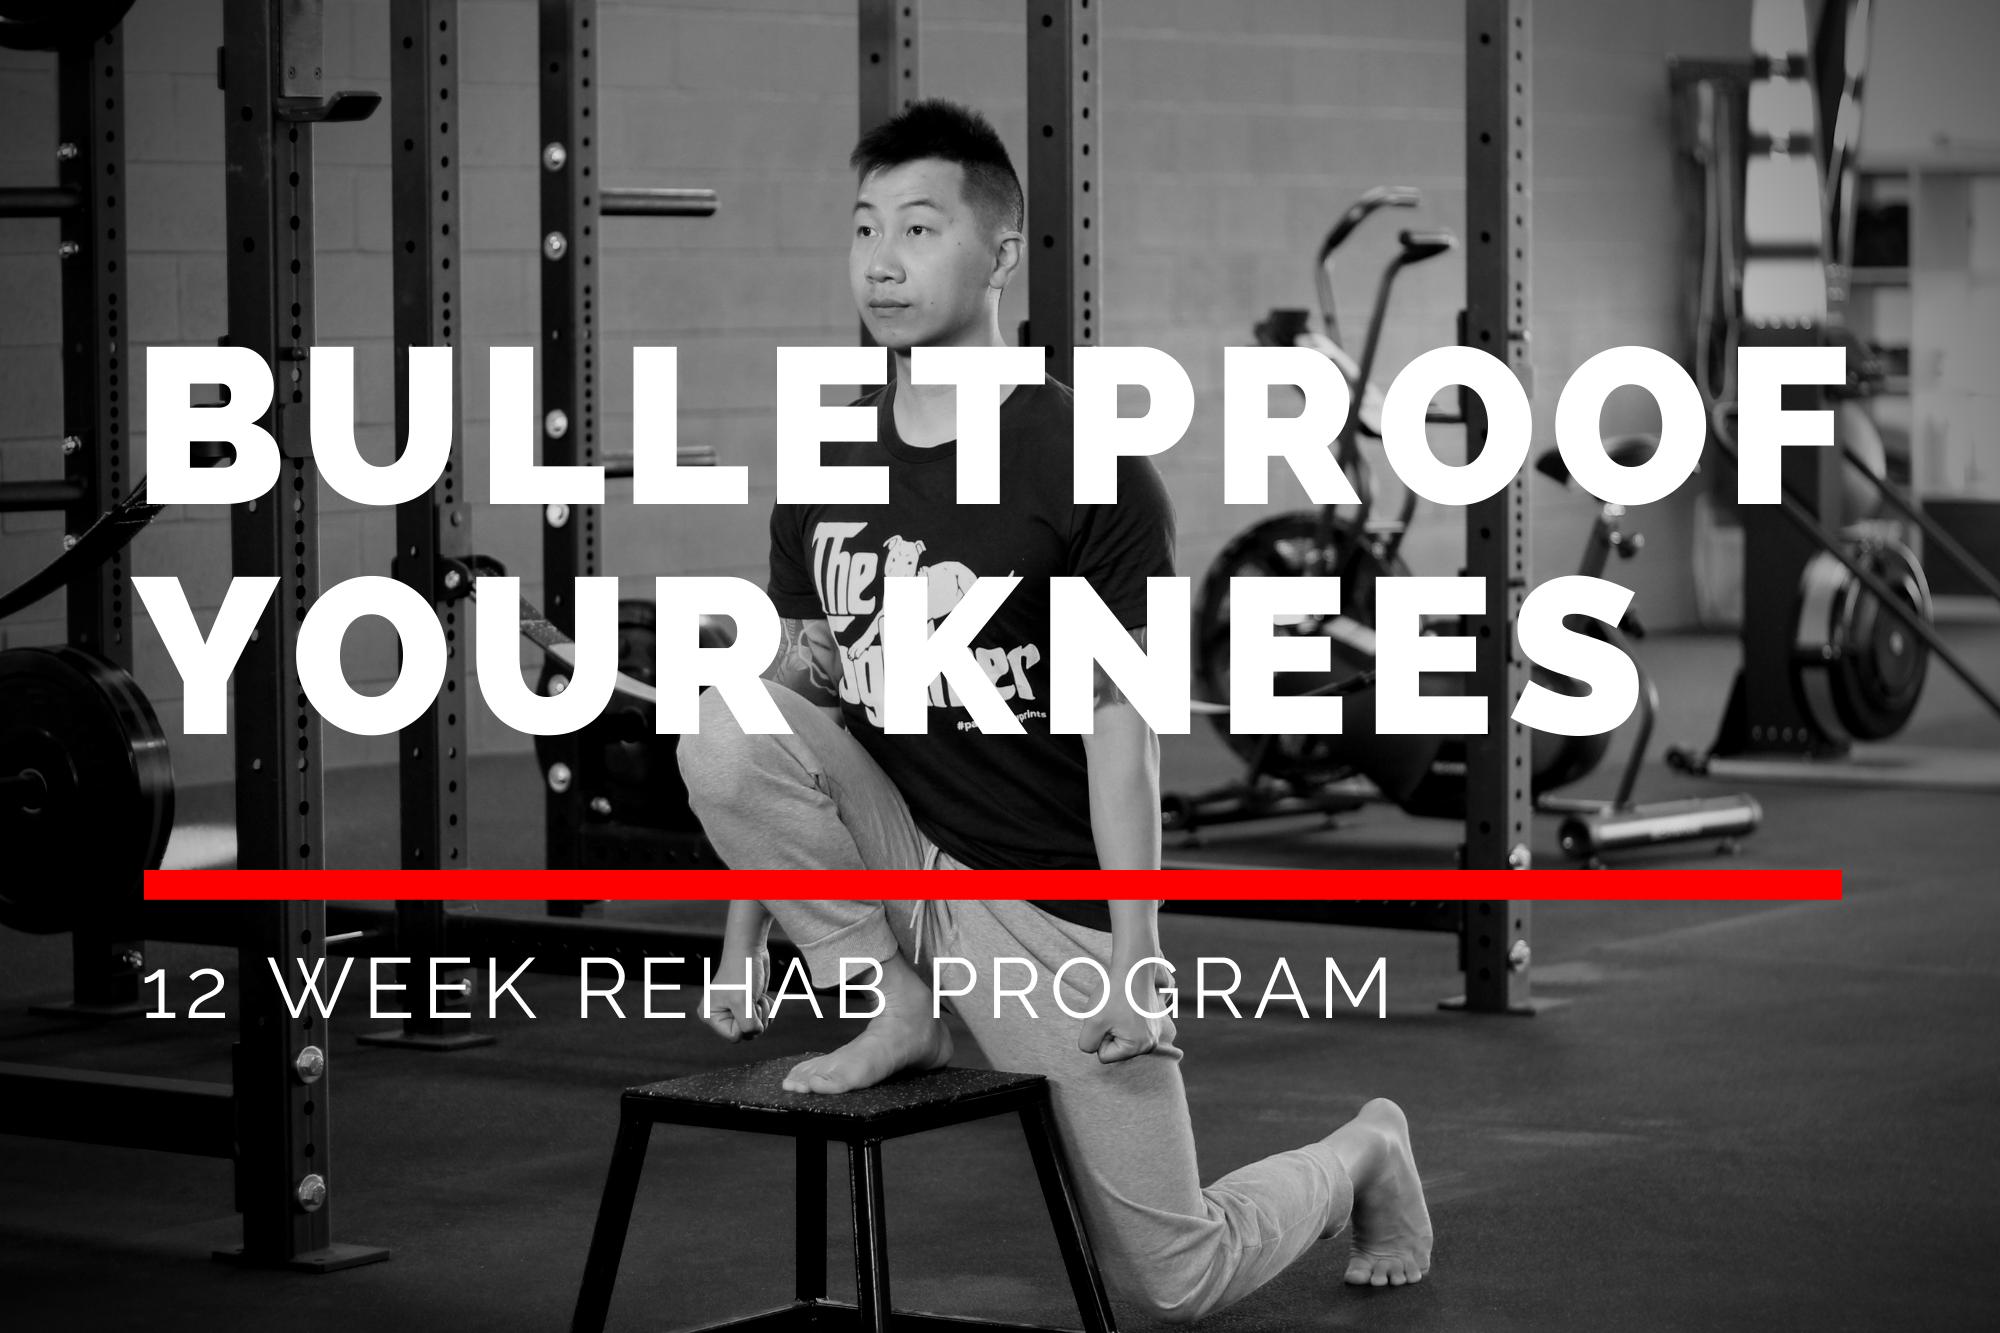 Bulletproof your Knees